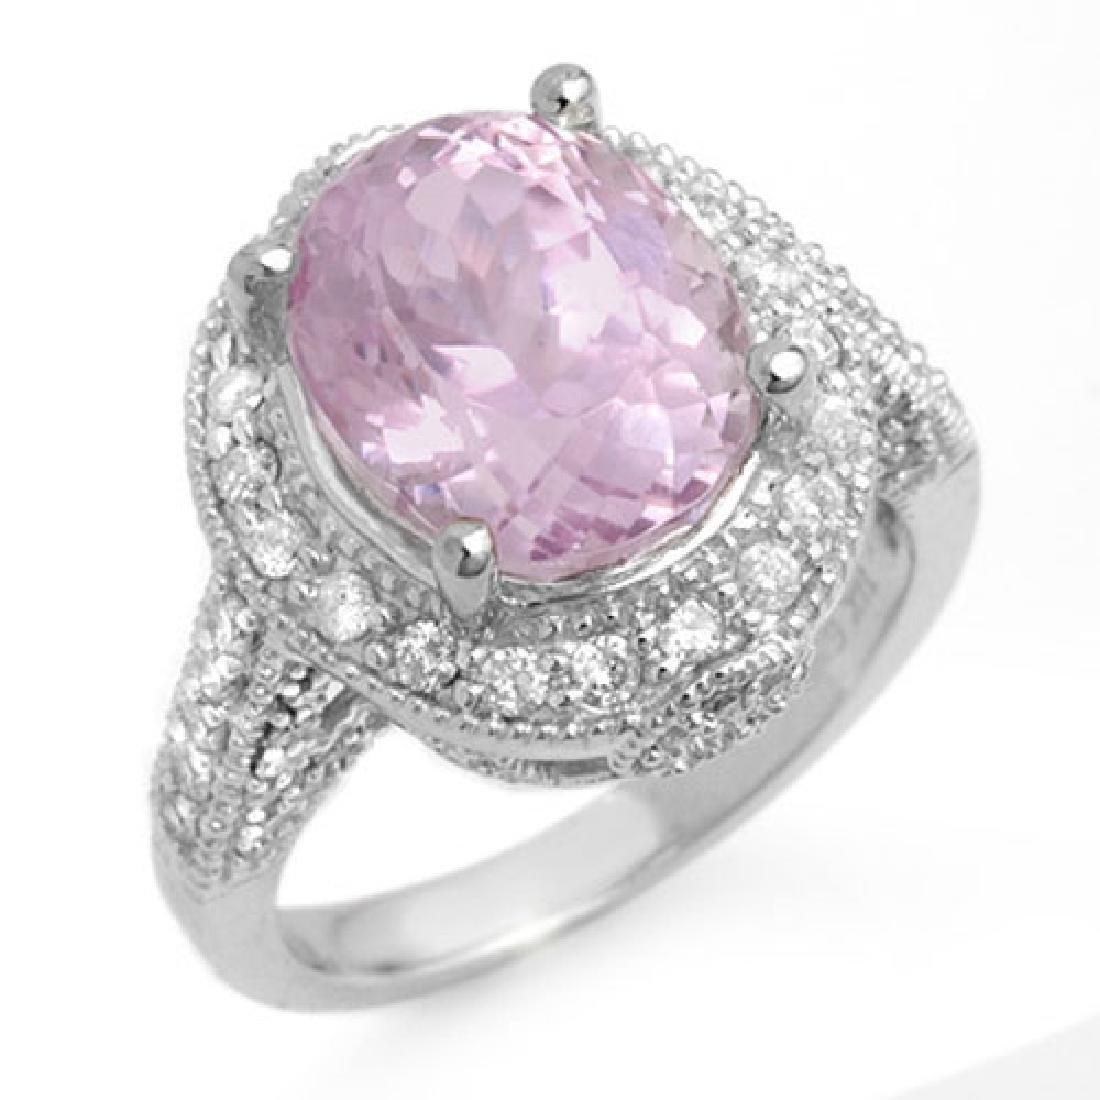 7.0 CTW Kunzite & Diamond Ring 14K White Gold